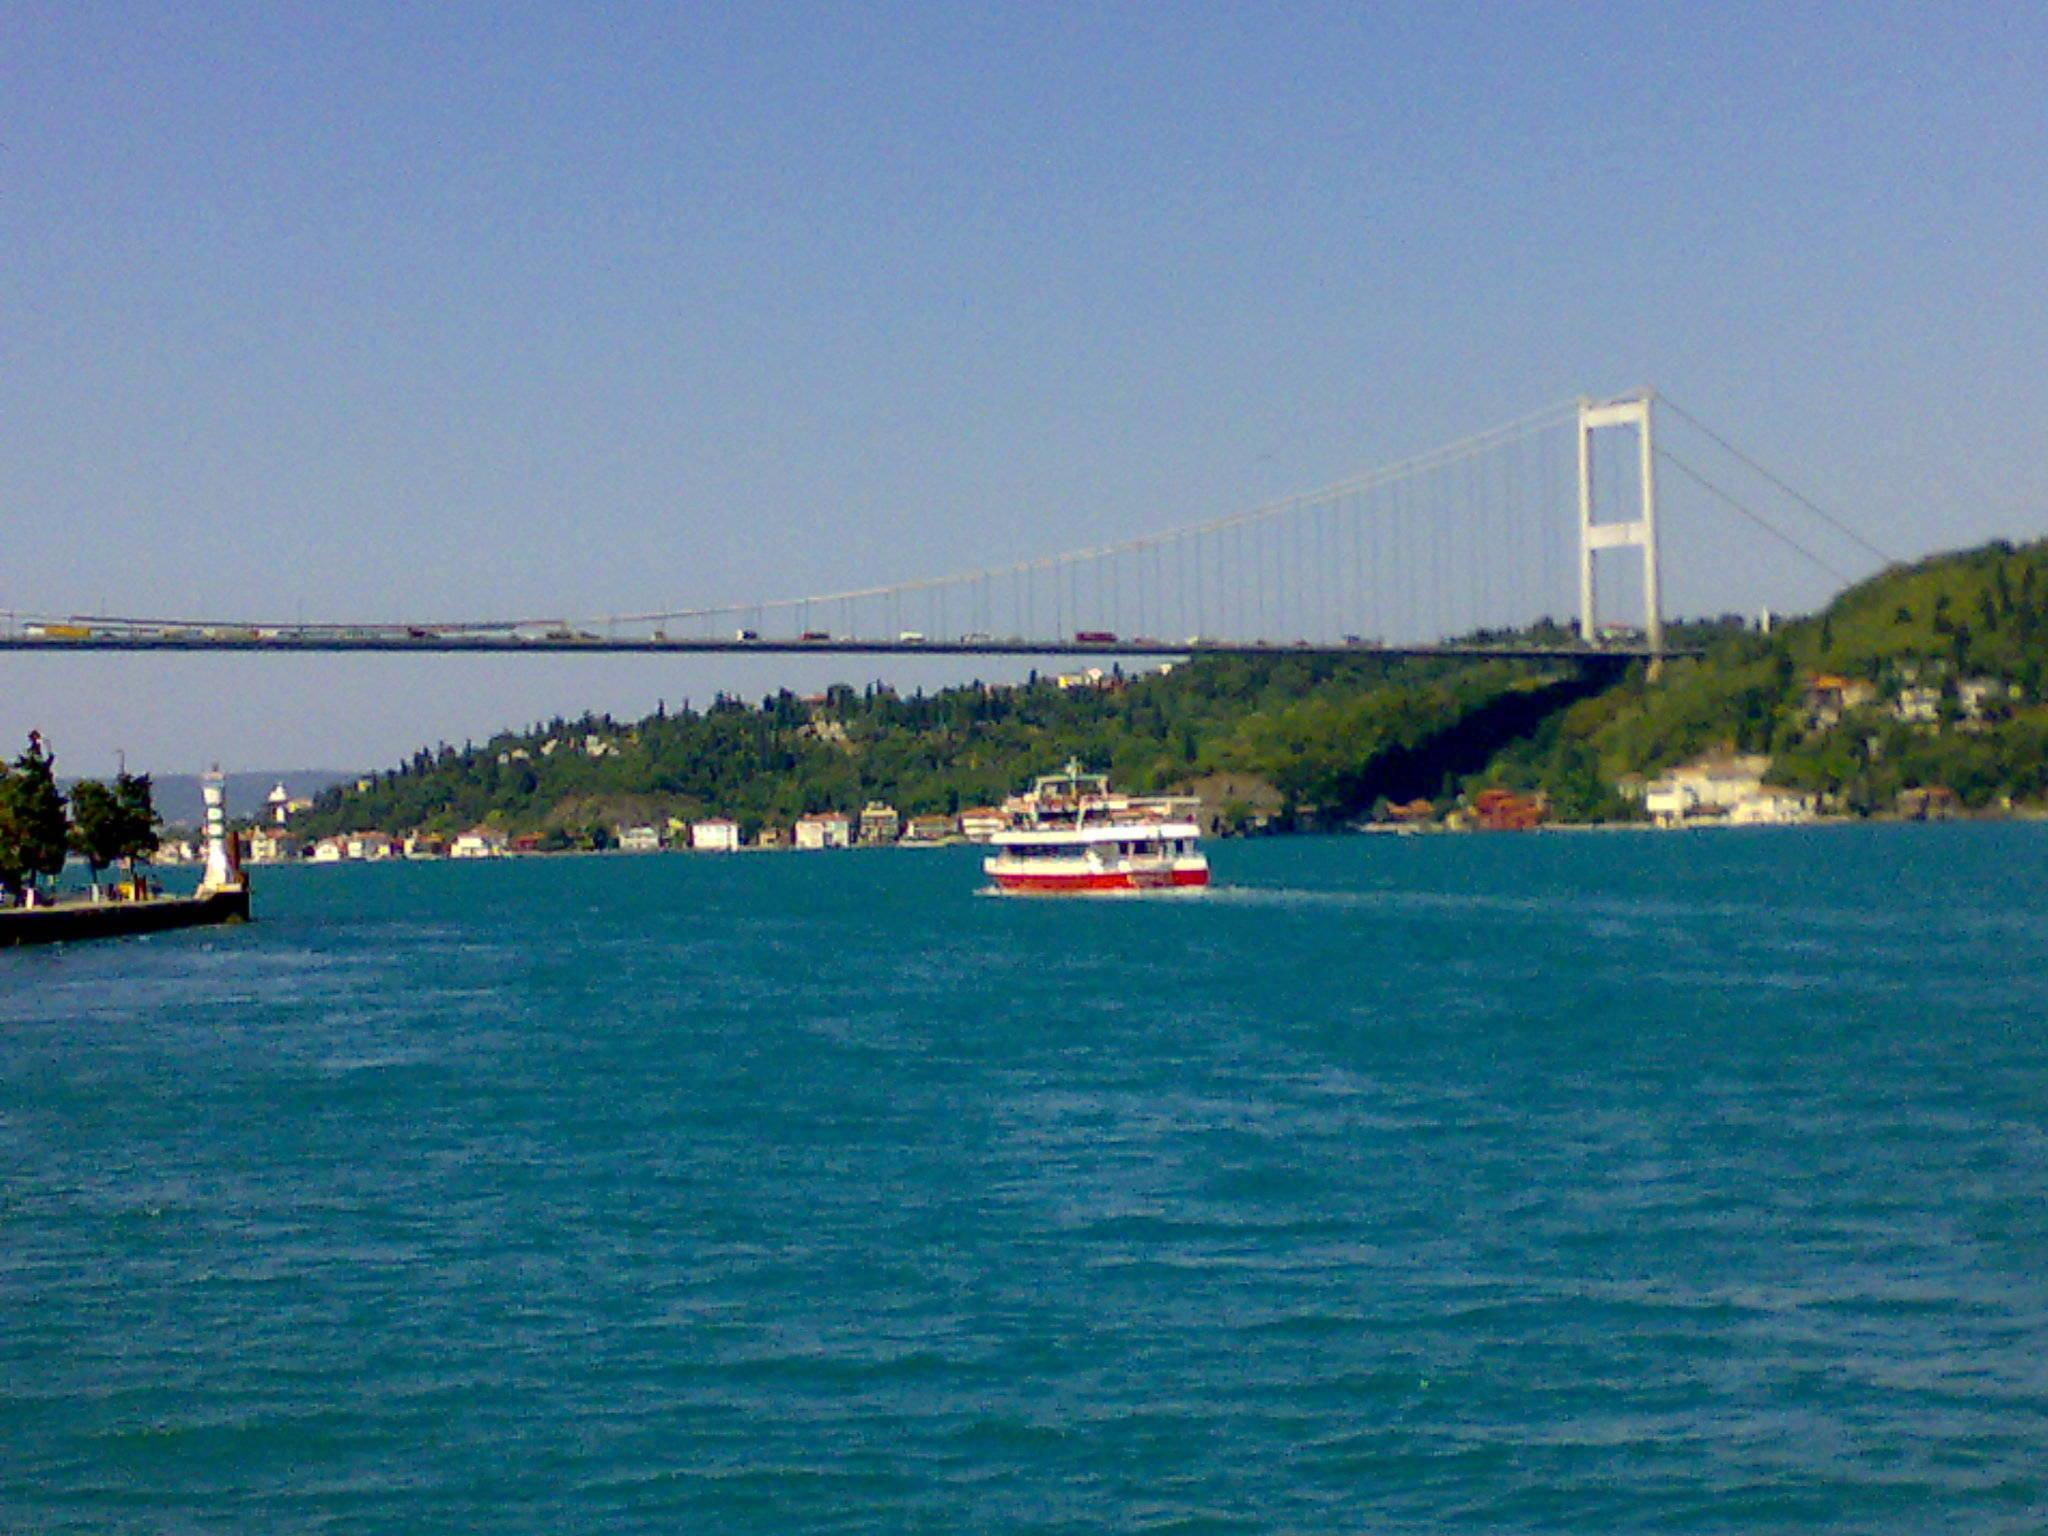 Istanbul gibisi yok... 2064011ac9a543f1d5d15d859690c993ce1d2f6